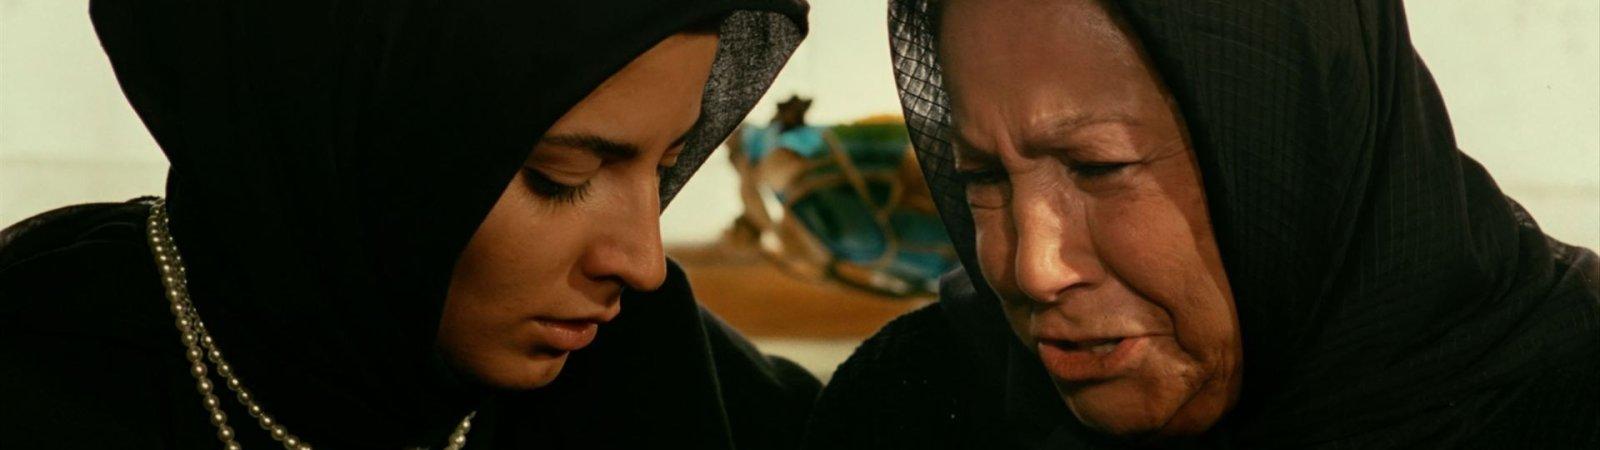 Photo dernier film Leila Hatami